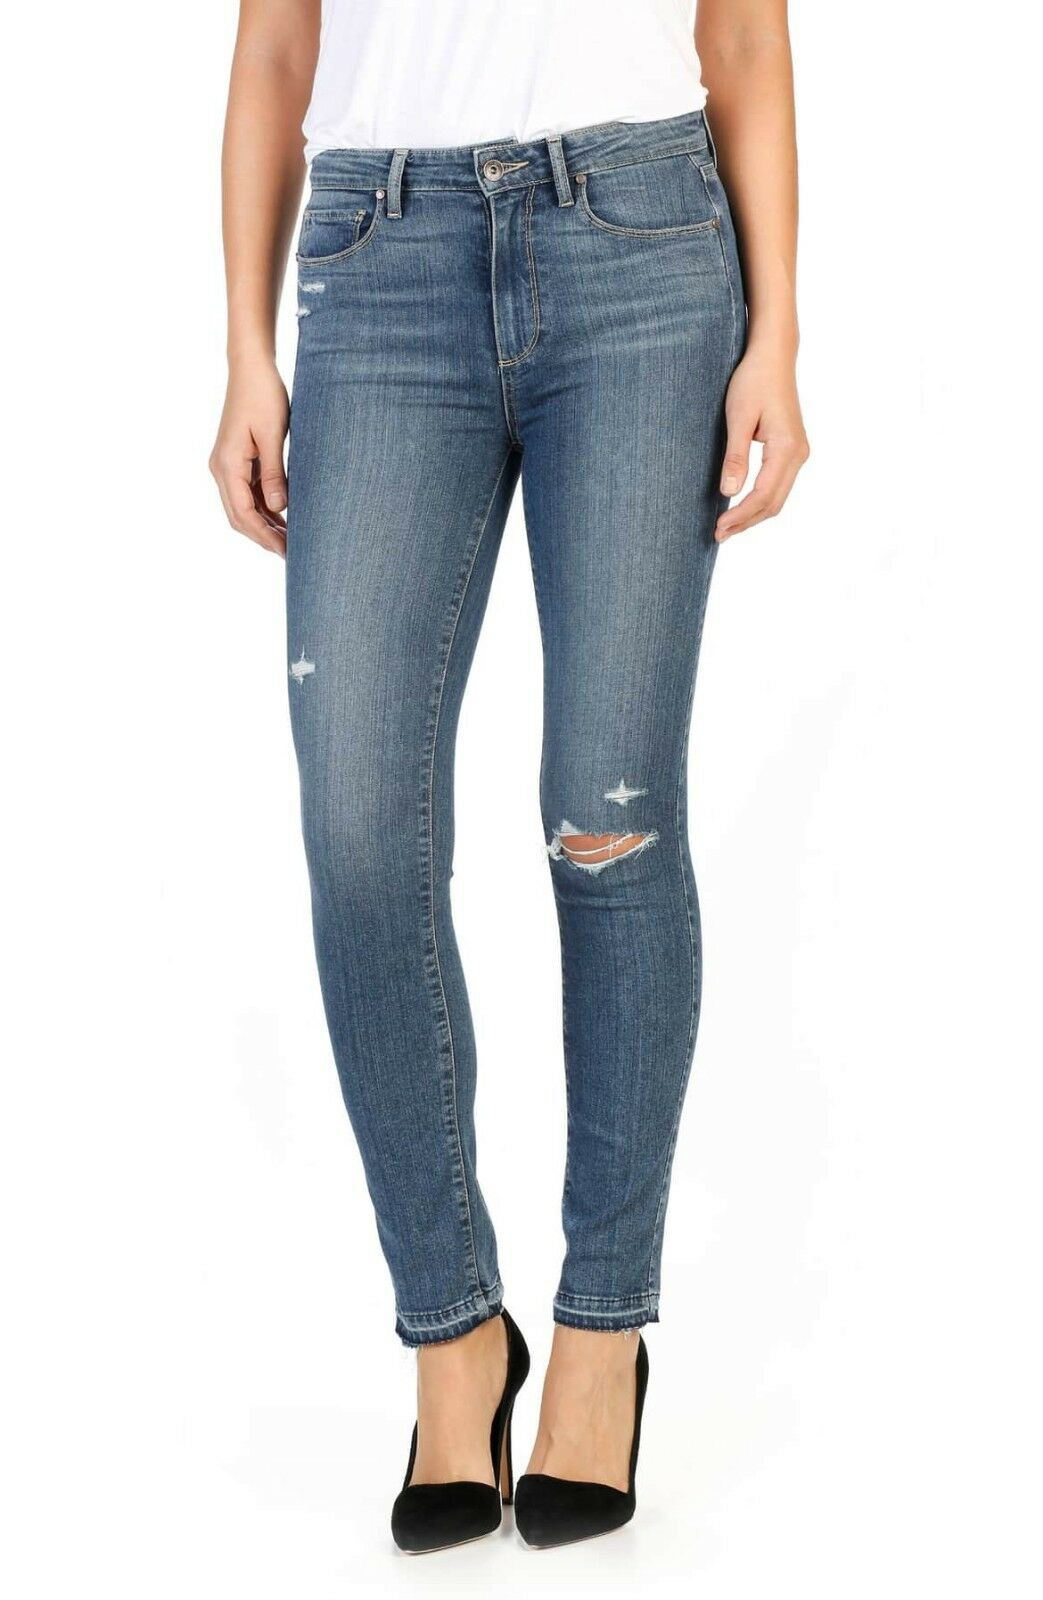 Paige Hoxton High Waist Ankle Peg Skinny Jeans Lexi Destructed Blau 29